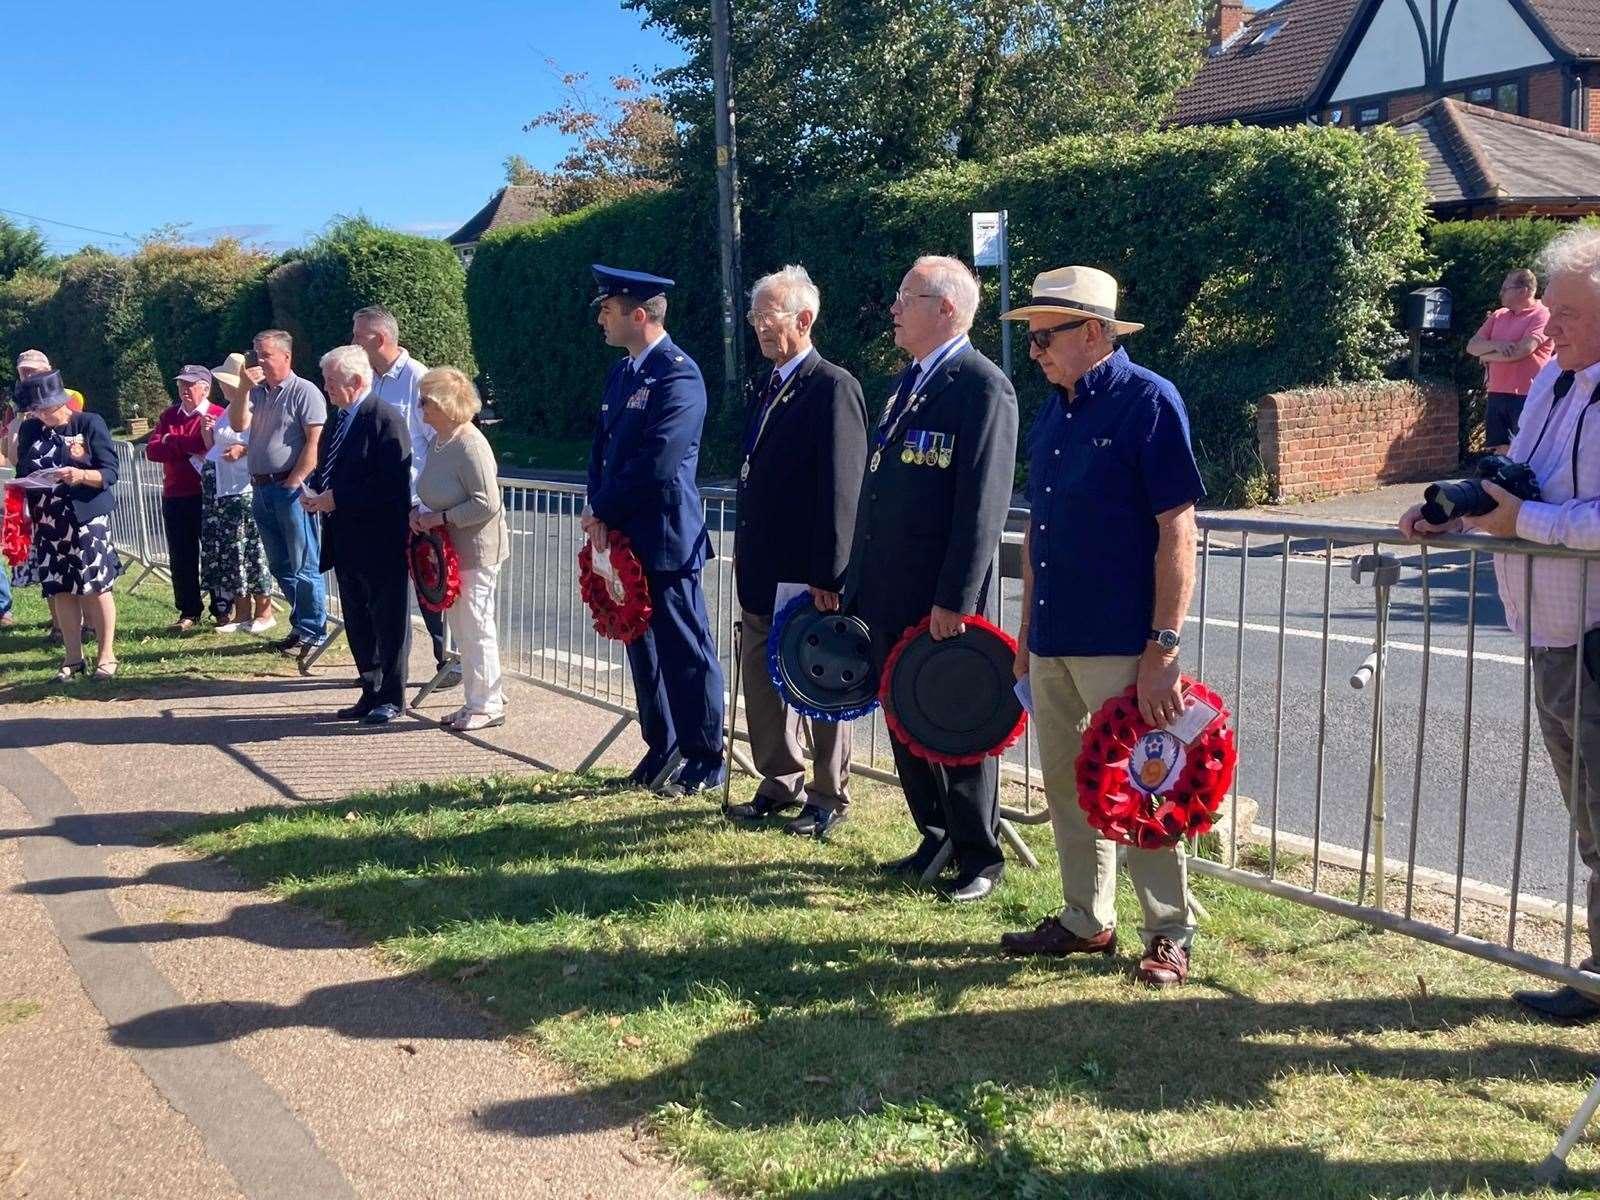 Hatfield Heath memorial (51649038)